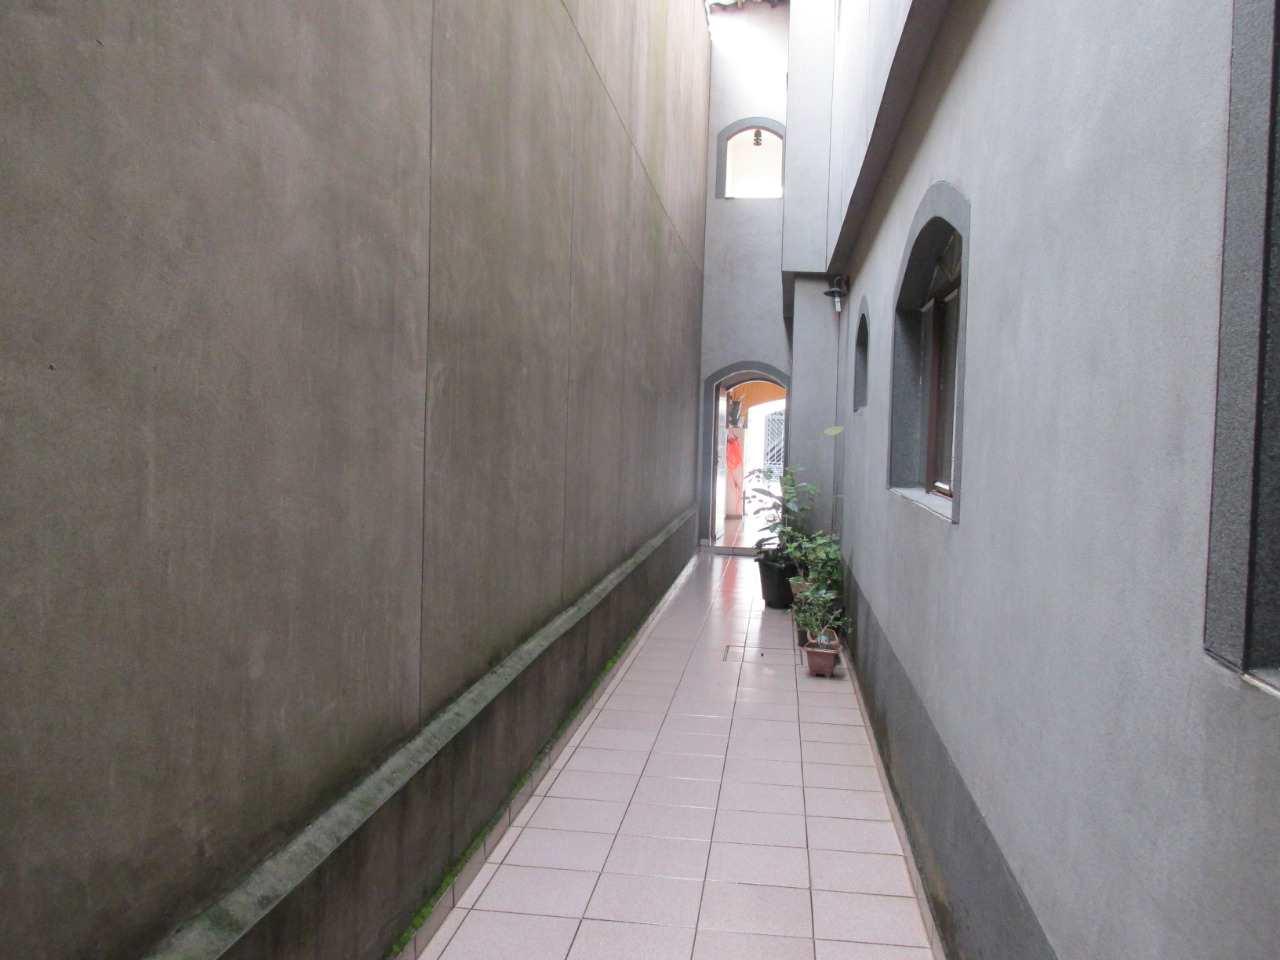 Sobrado com 3 dorms, Jardim Las Vegas, Santo André - R$ 530 mil, Cod: 1681